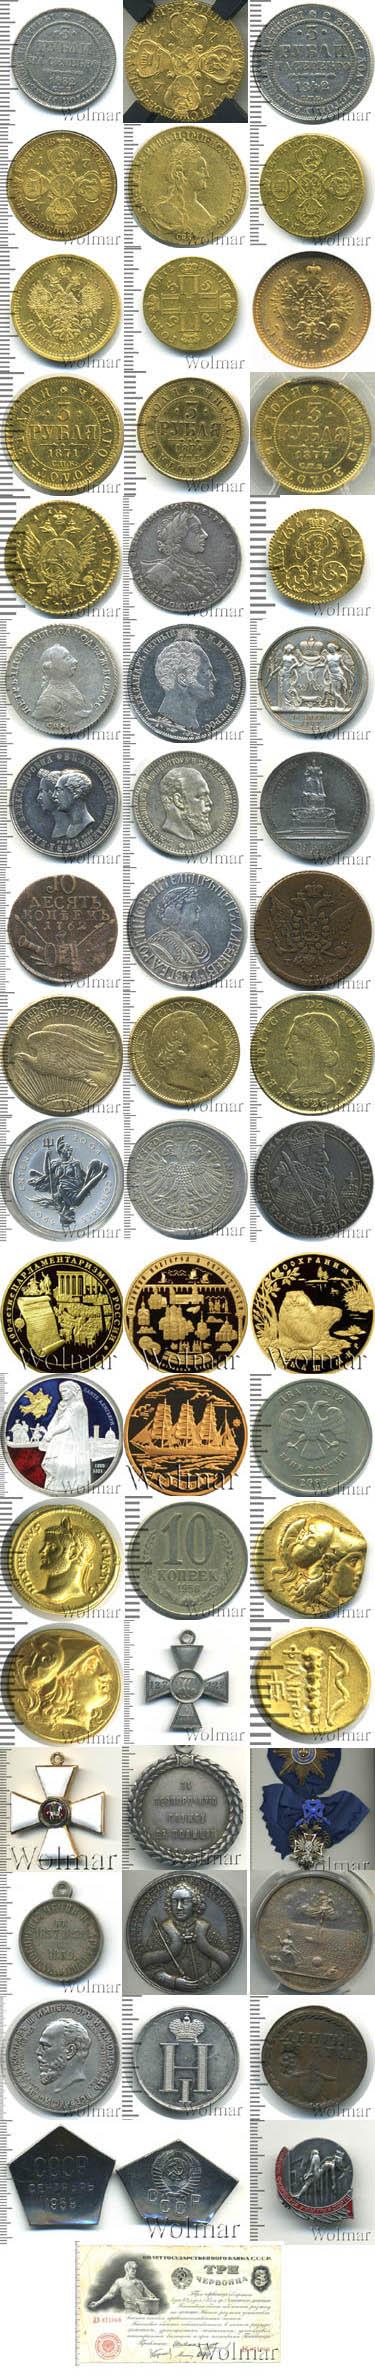 скупка монет в петрозаводске